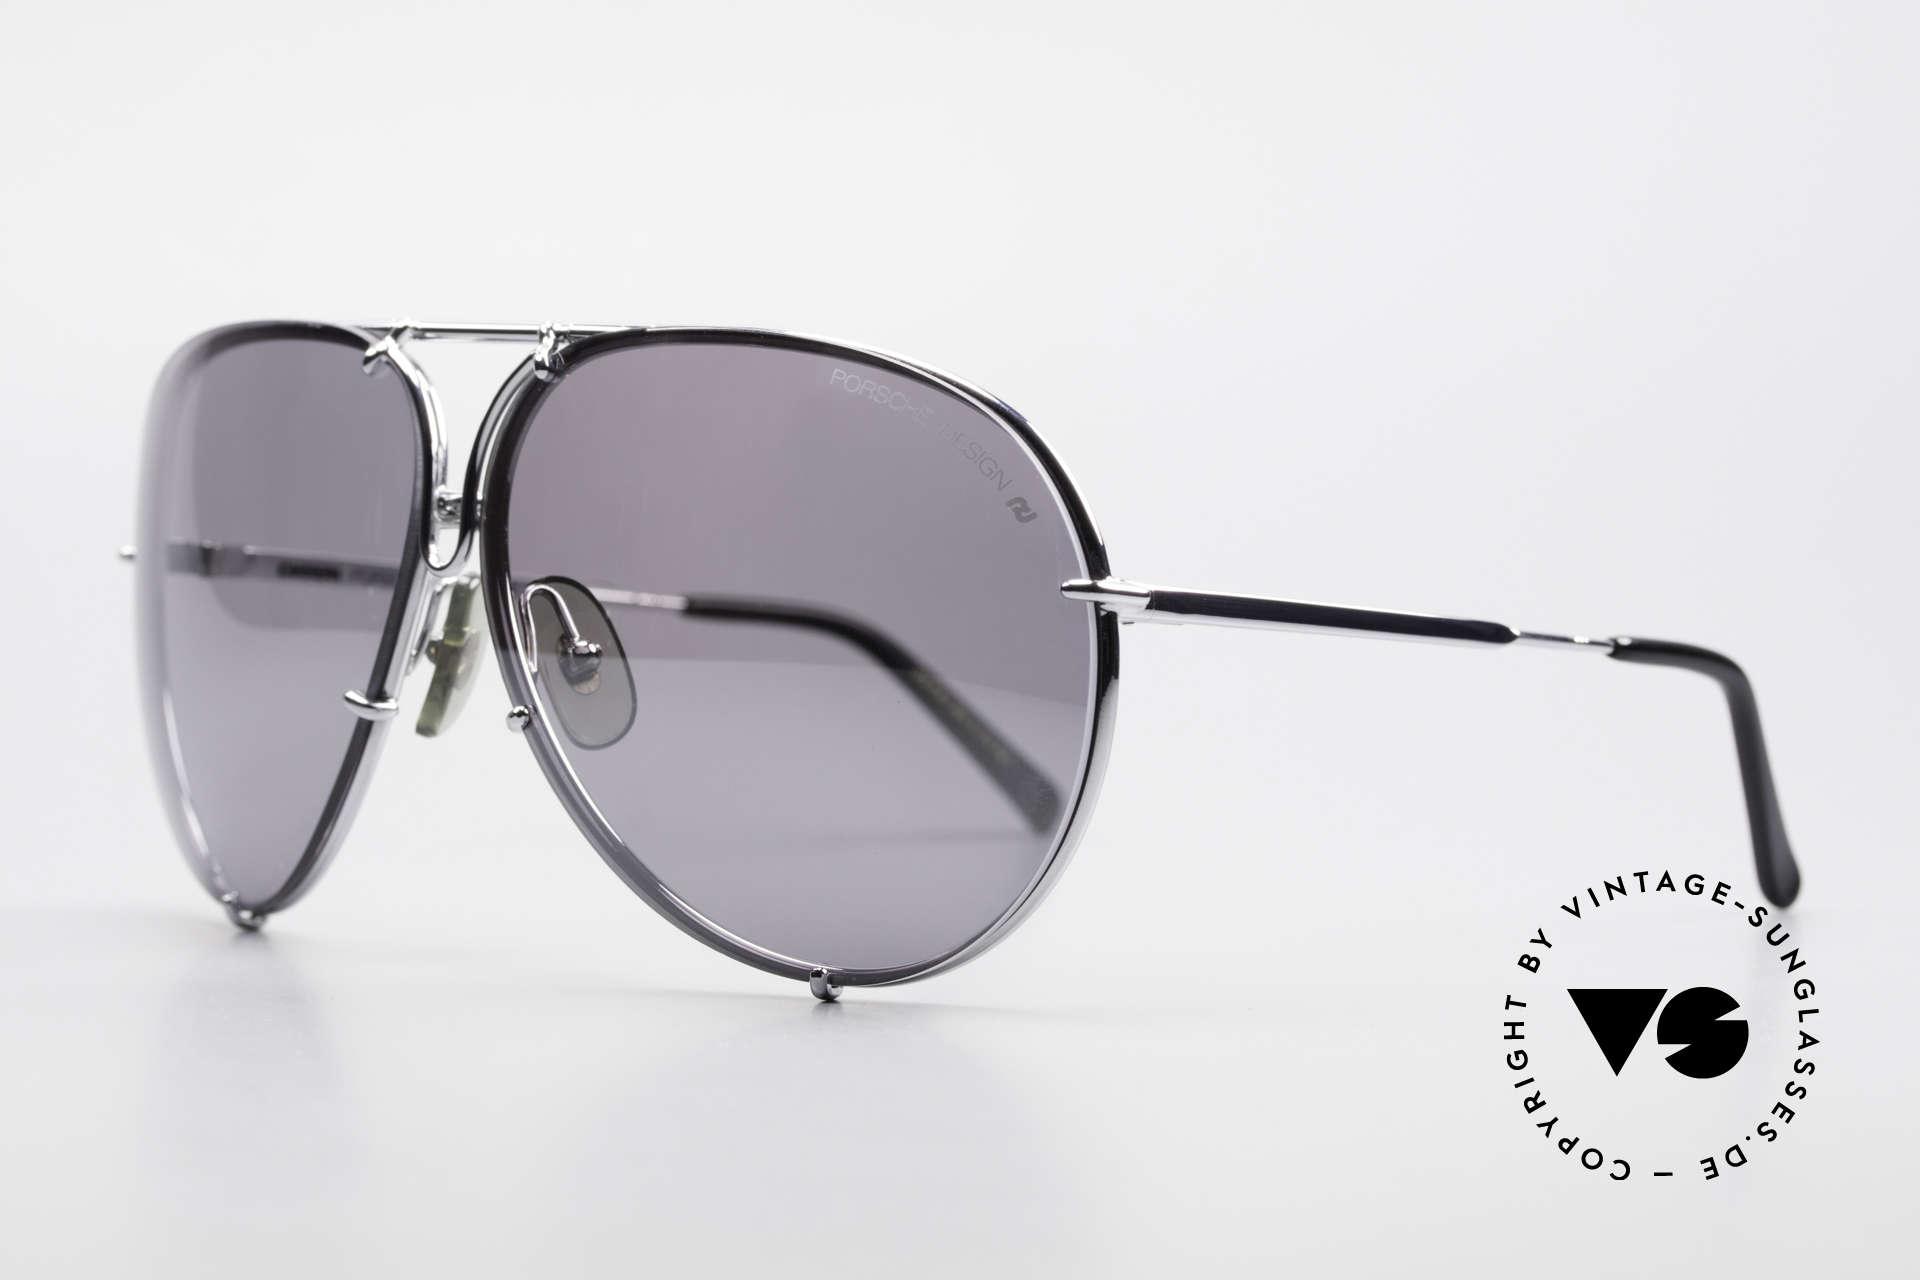 Porsche 5623 Silver Mirrored Sun Lenses, SILVER MIRRORED lenses appear gray on the photos, Made for Men and Women